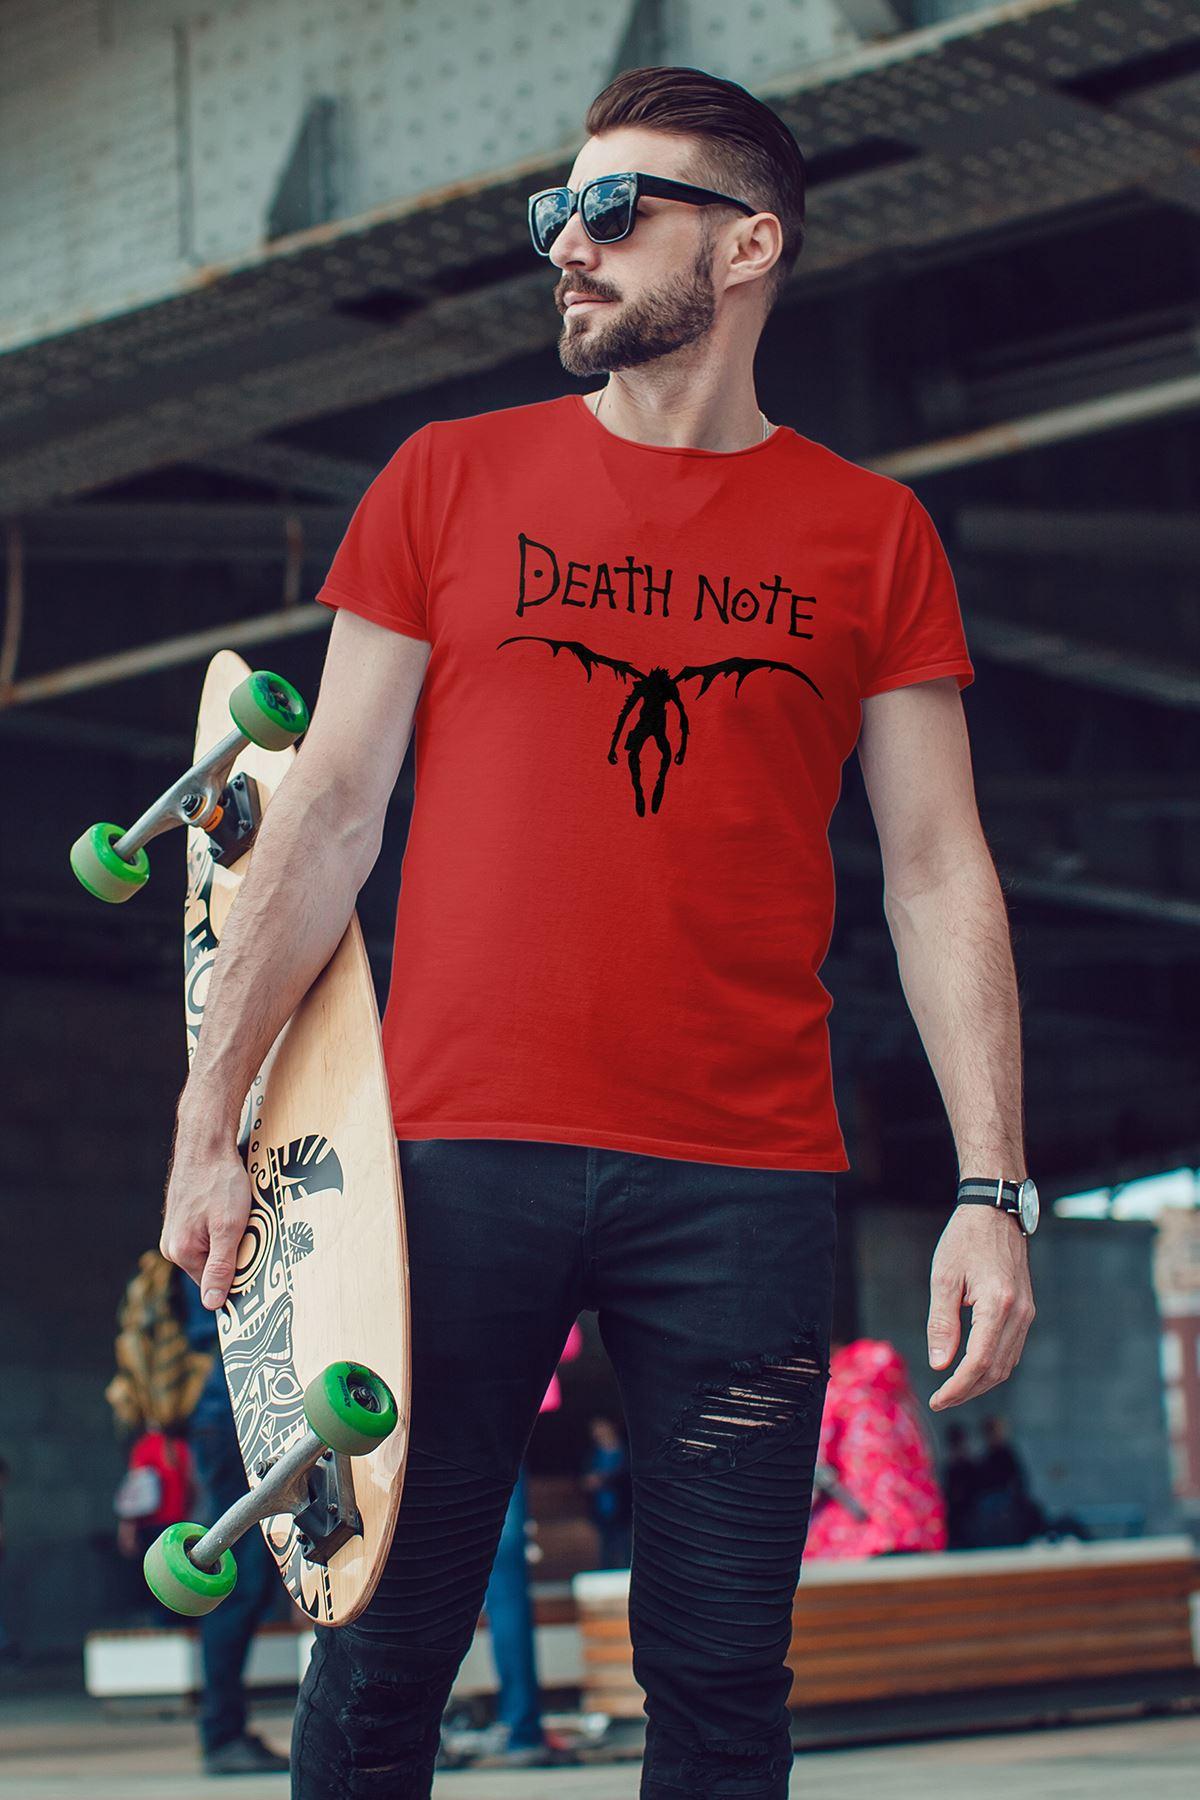 Anime Death Note 08 Kırmızı Erkek Tshirt - Tişört